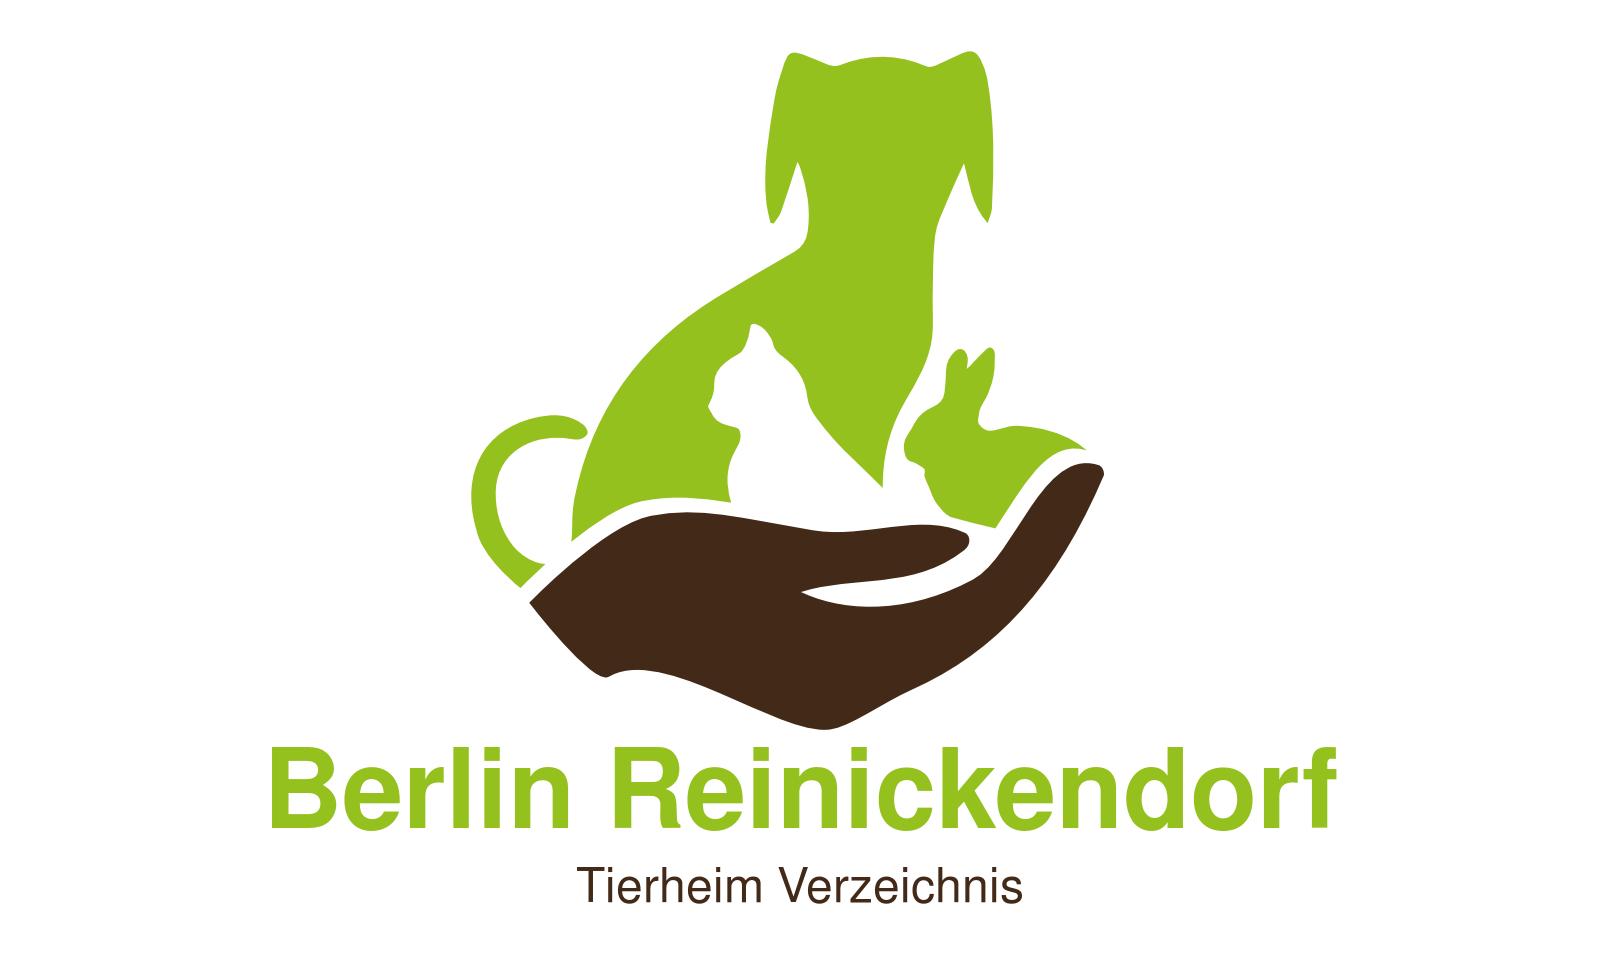 Tierheim Berlin Reinickendorf